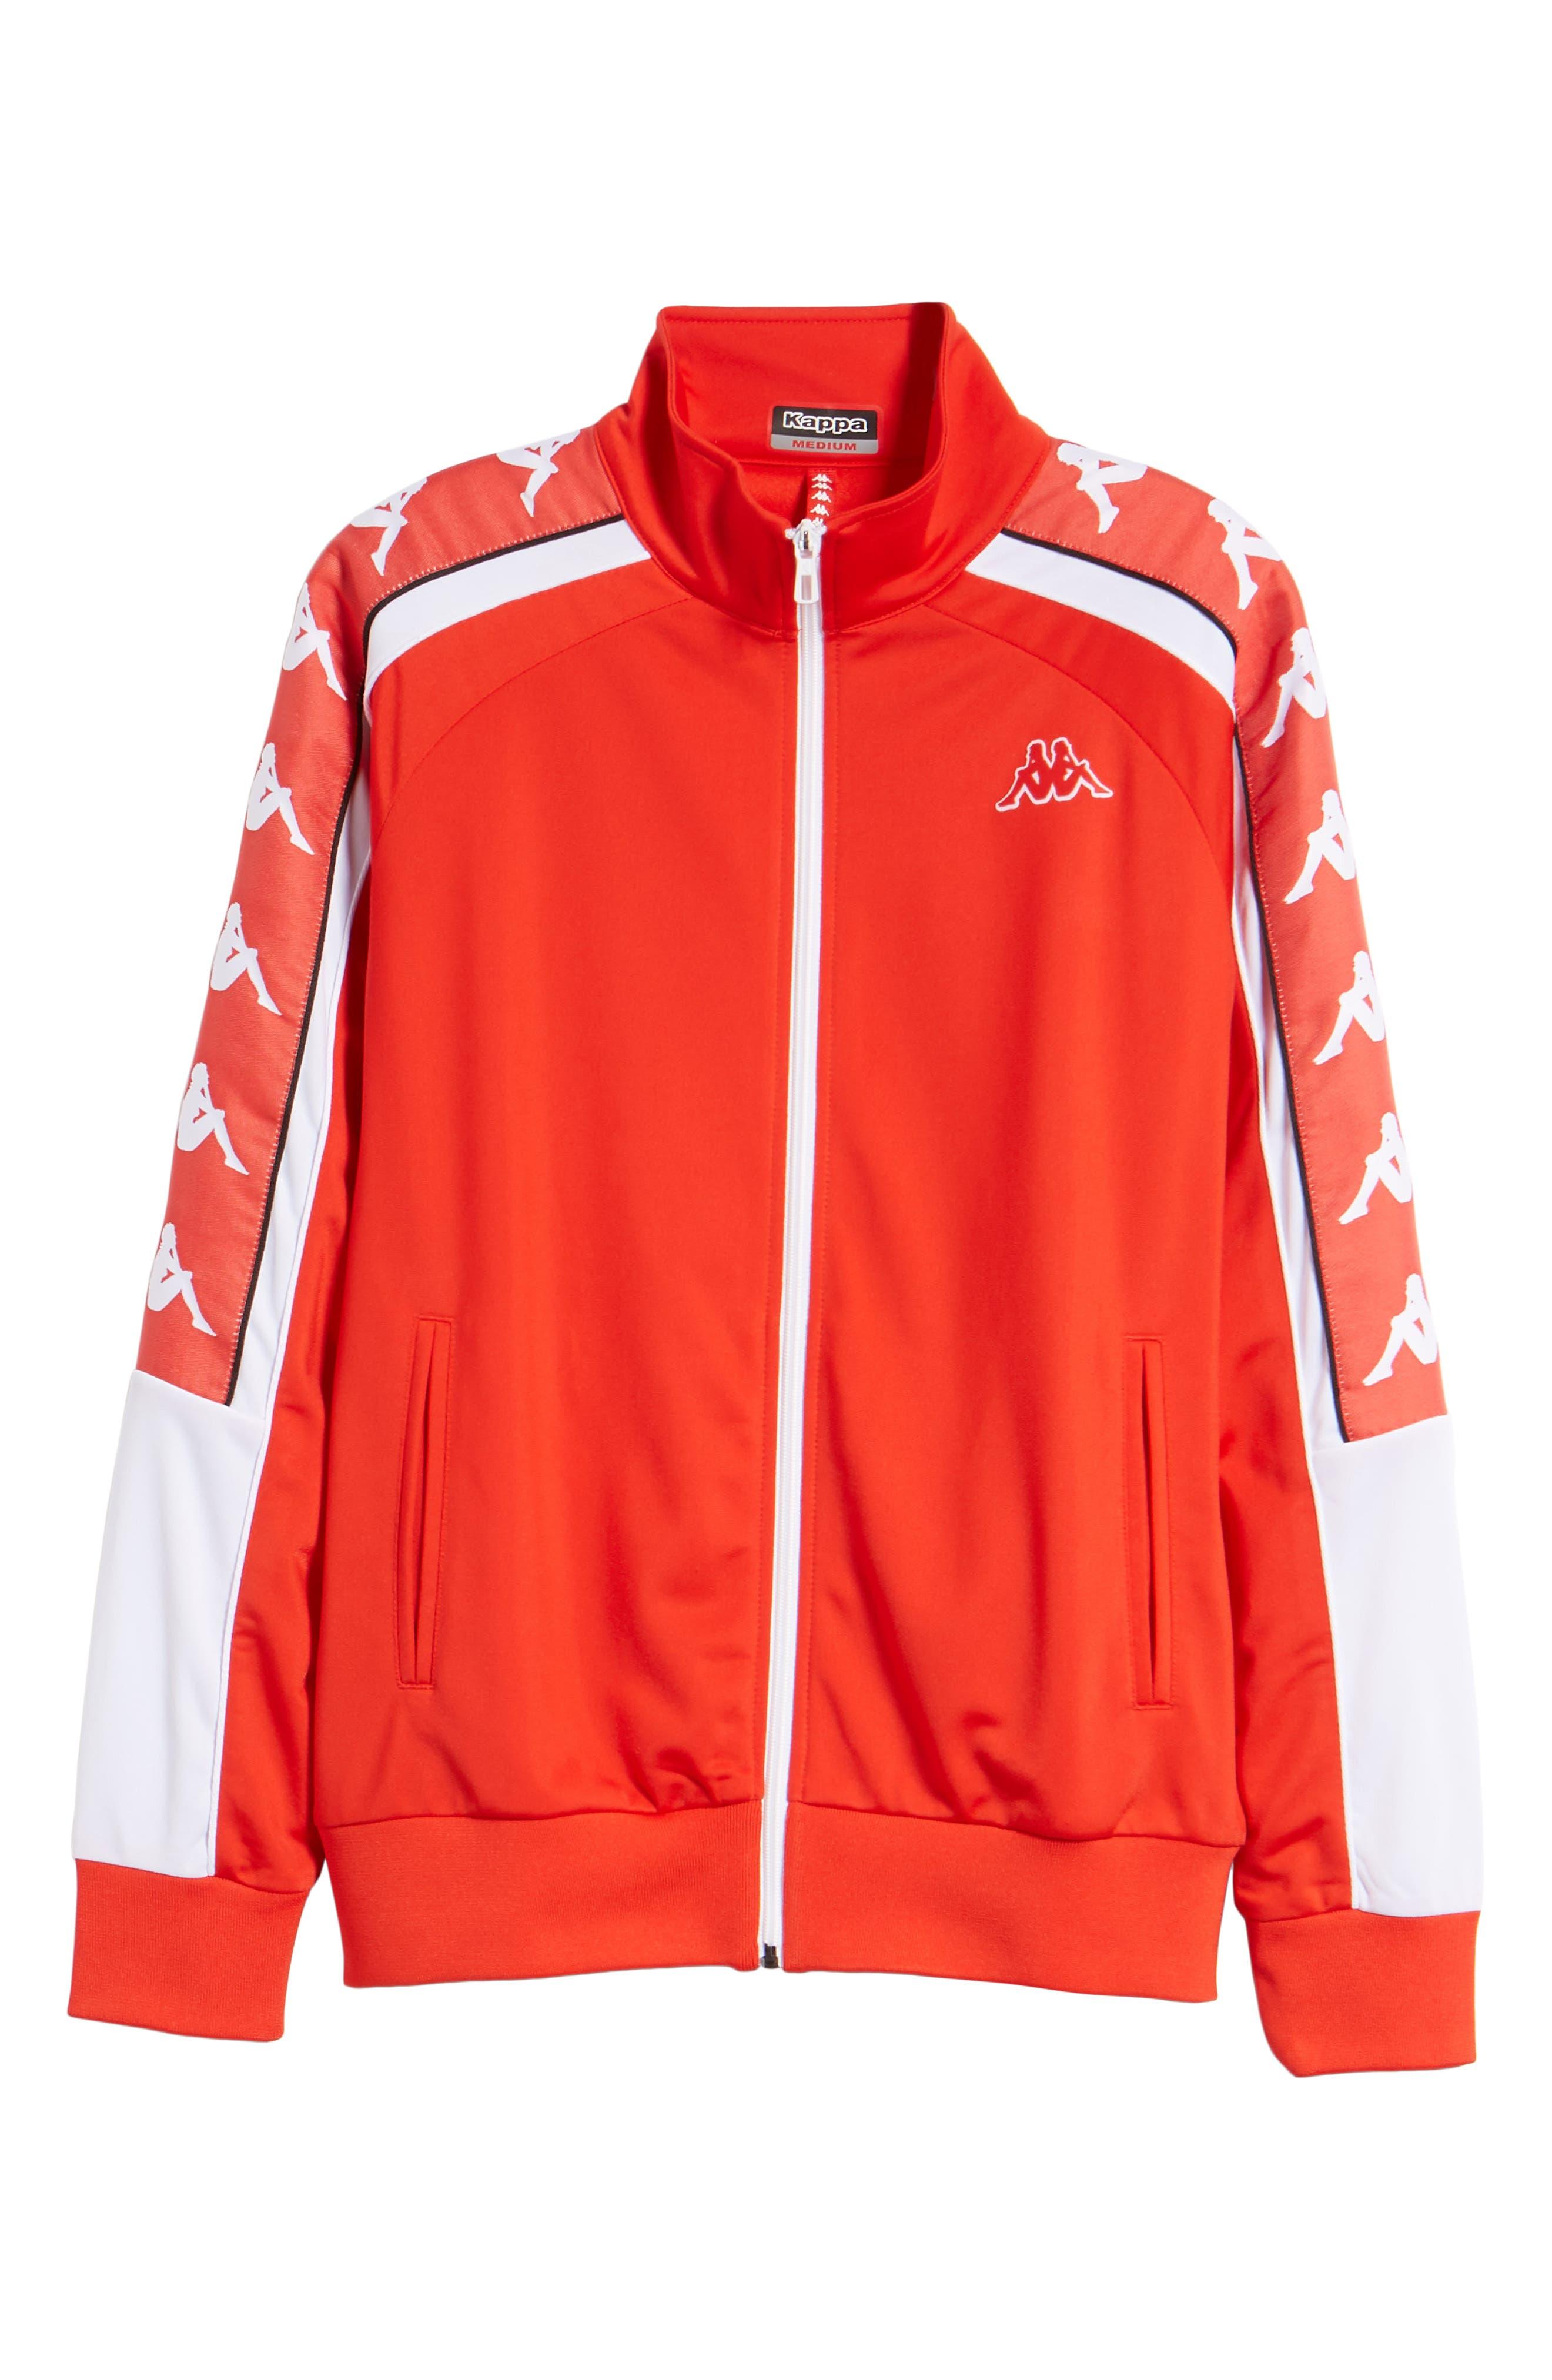 222 Banda 10 Anay Jacket,                             Alternate thumbnail 7, color,                             Red Flame -White